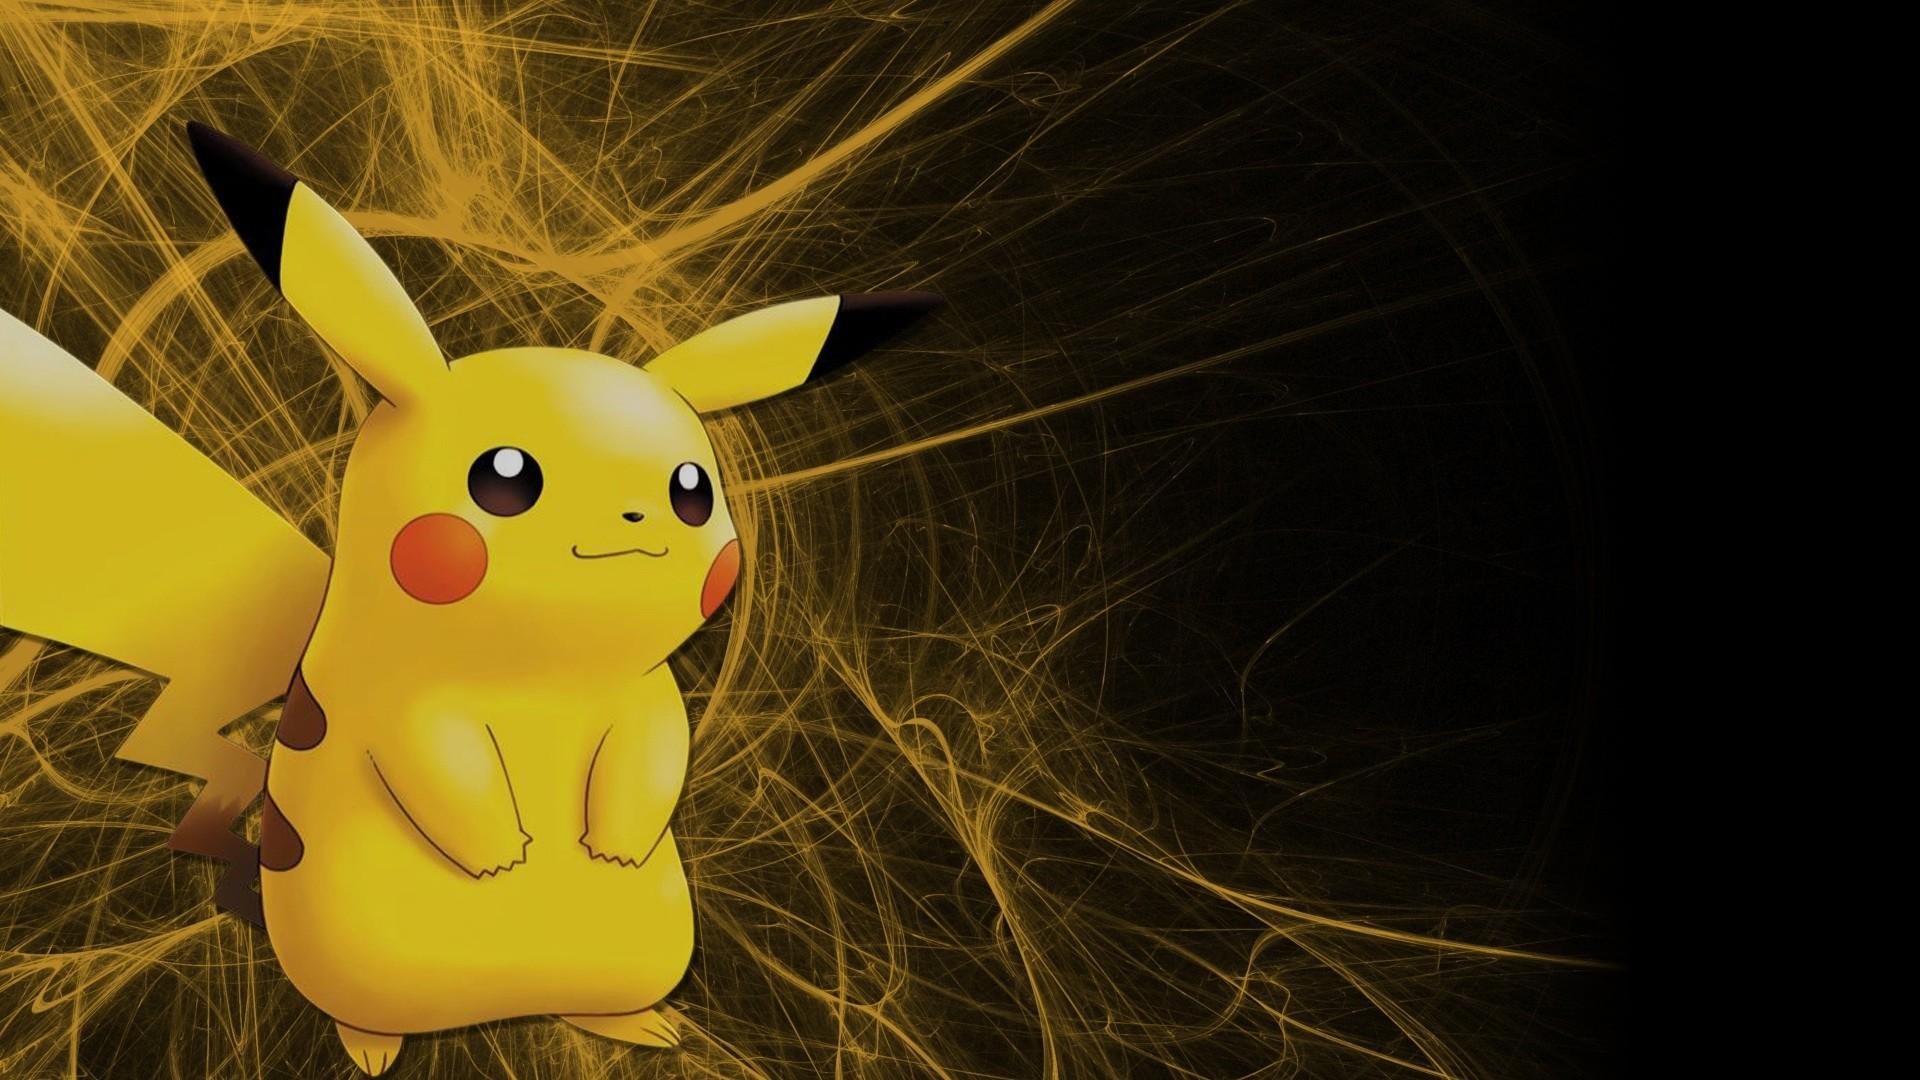 Pikachu, Pikachu against a simple black background. Keeping it classy.